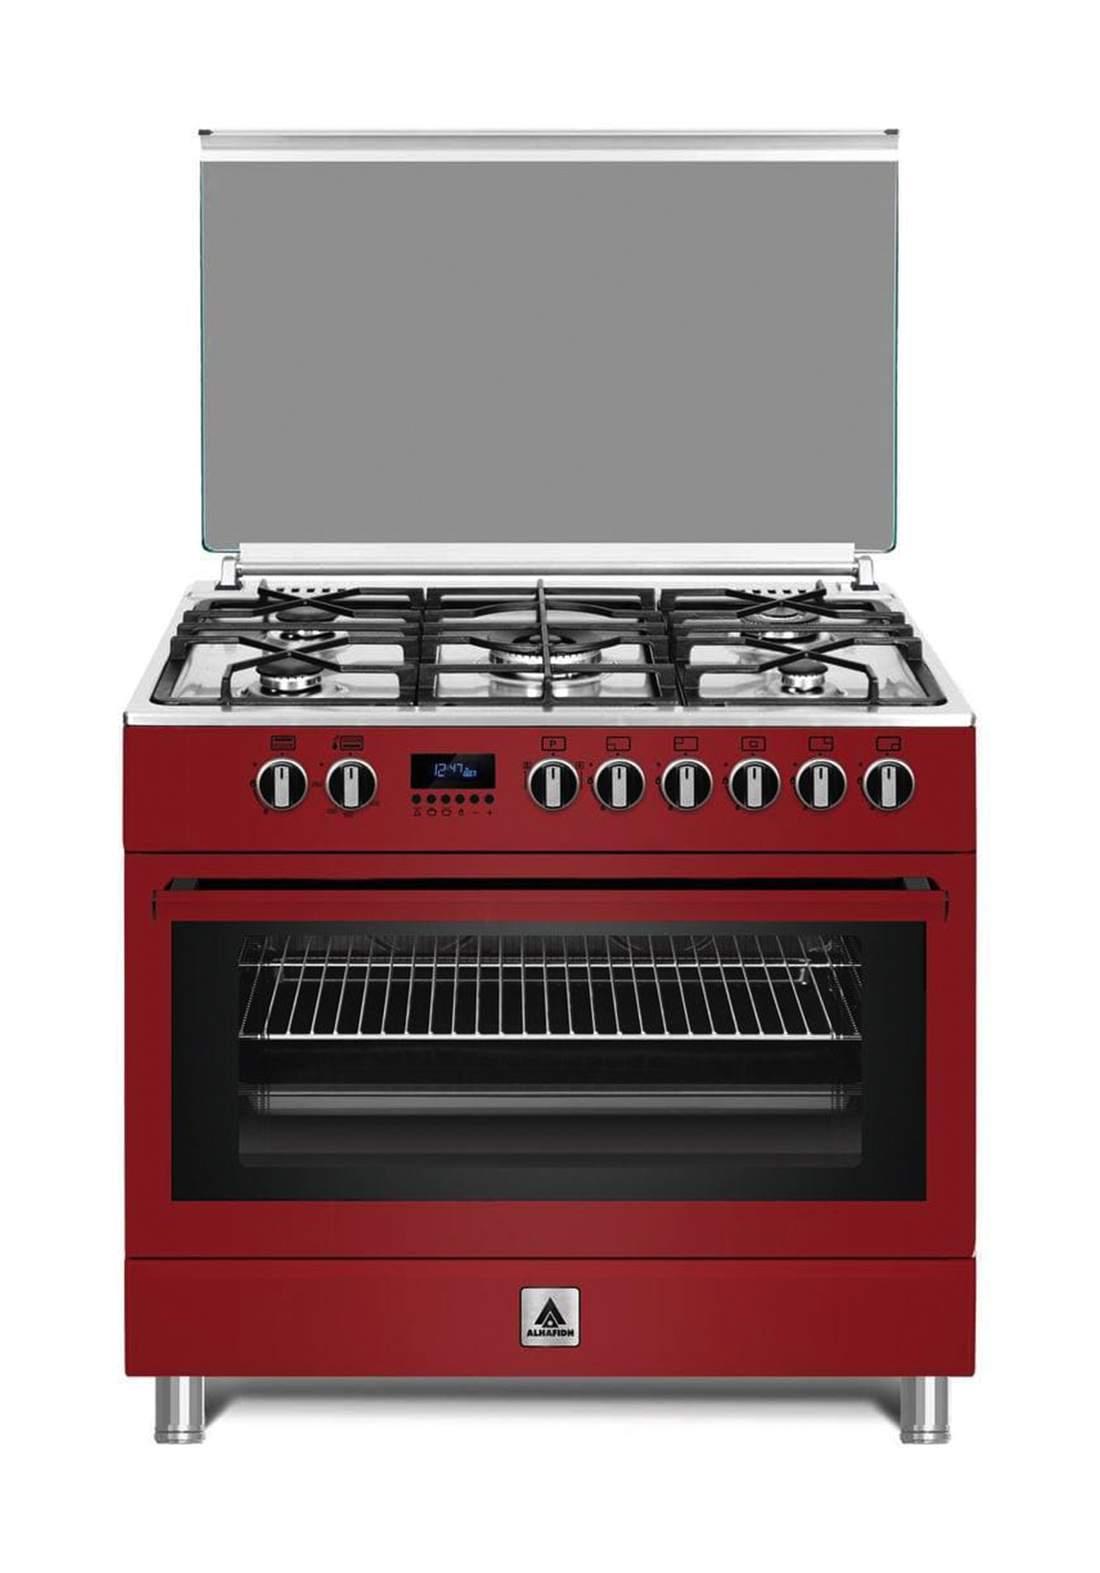 Alhafidh GCHA-90RDD43-5 Burners Gas Cooker 90x60cm طباخ غازي